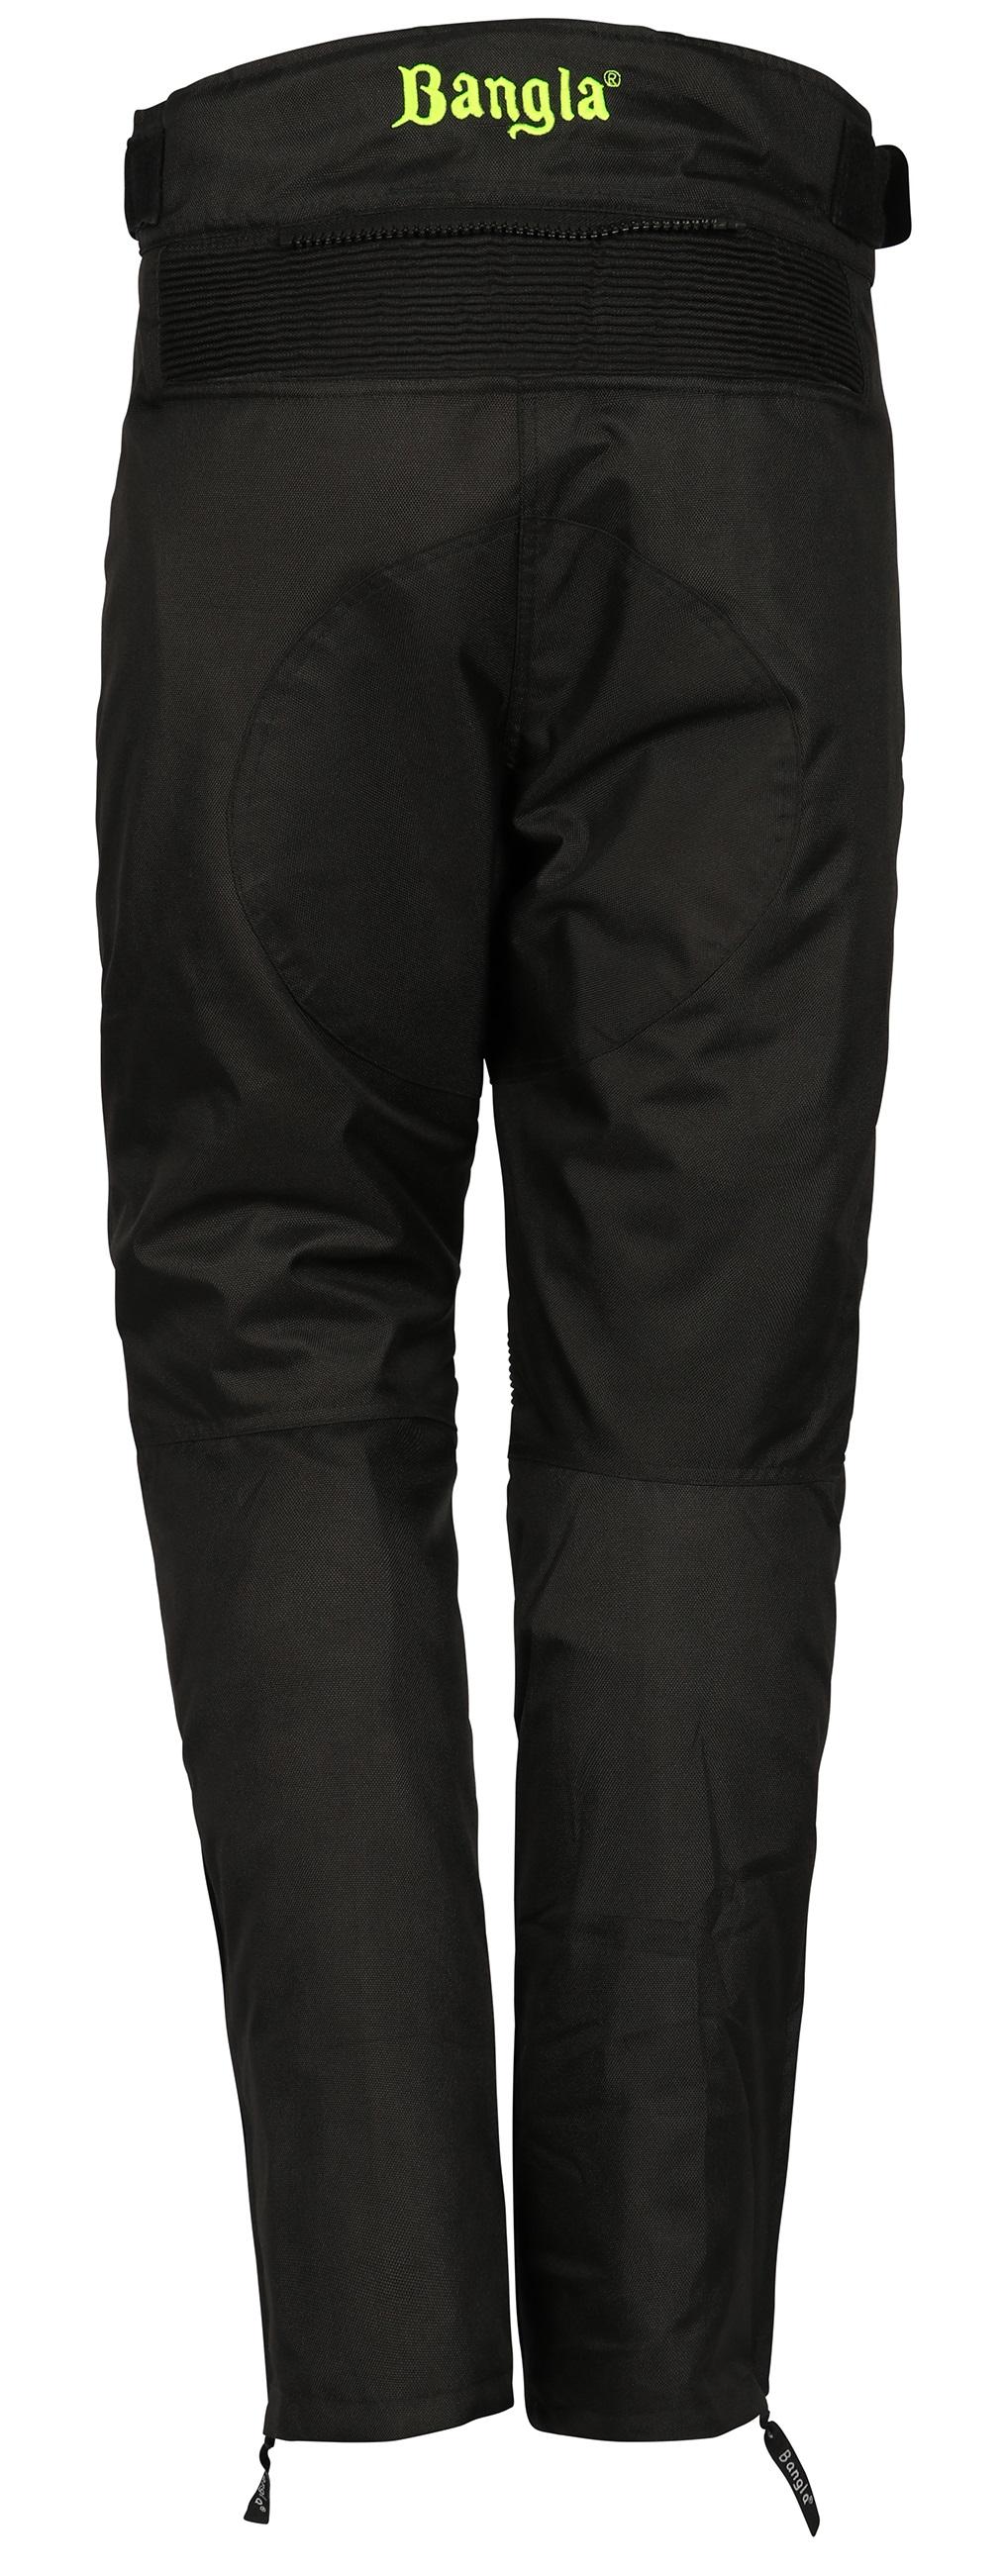 Bangla Damen Motorrad Hose Motorradhose Cordura Textil Schwarz Neongelb S - XXXL